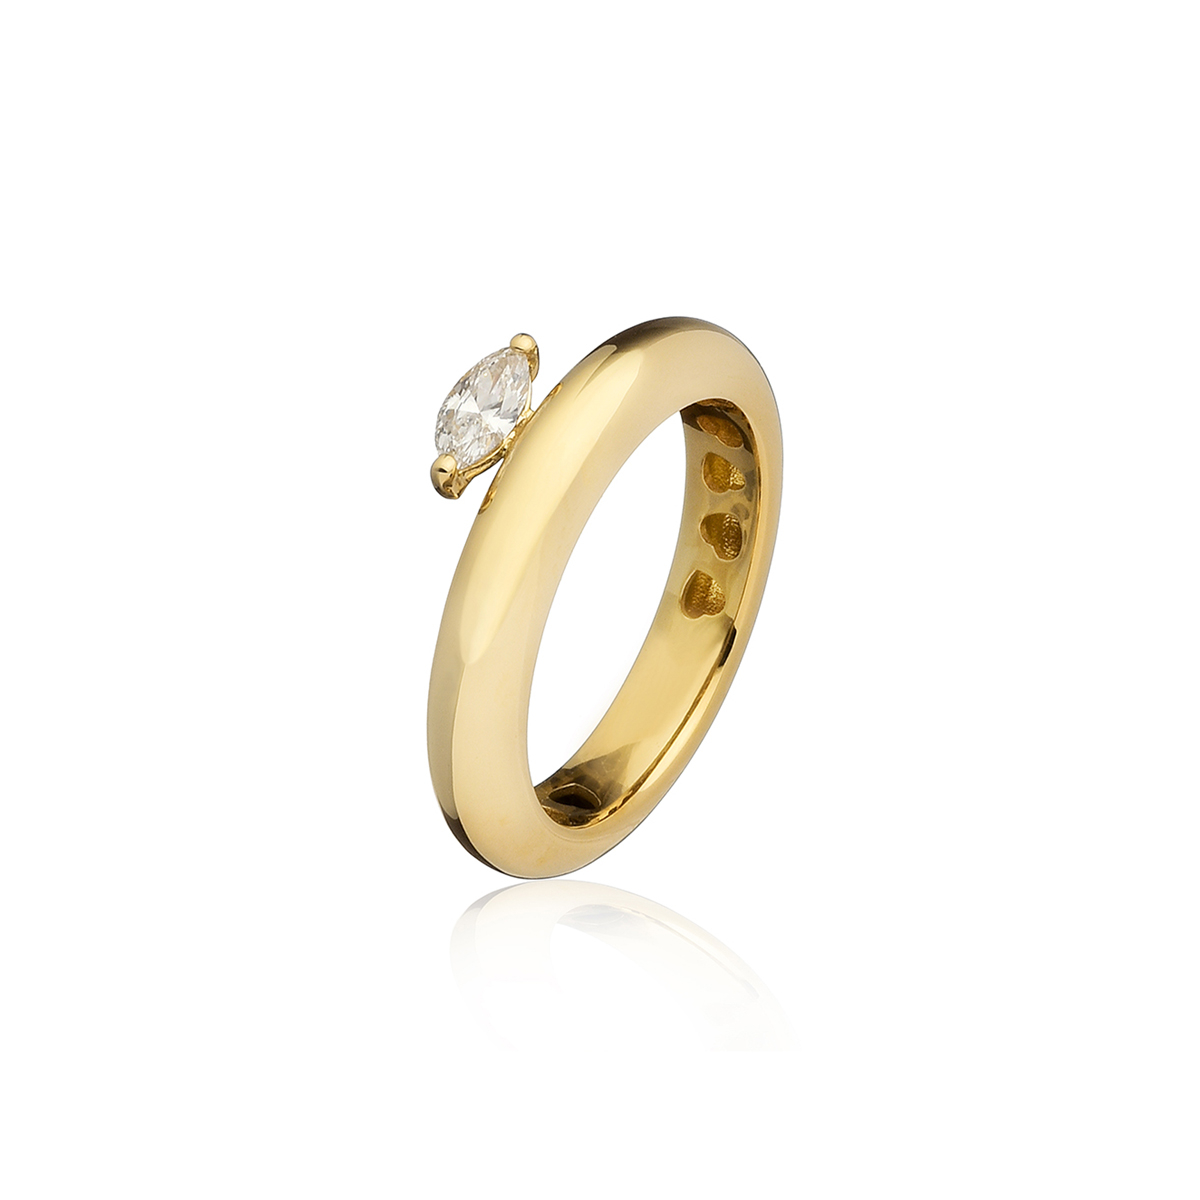 Chubby - Fancy Diamond Marquise Ring (Thin Version)